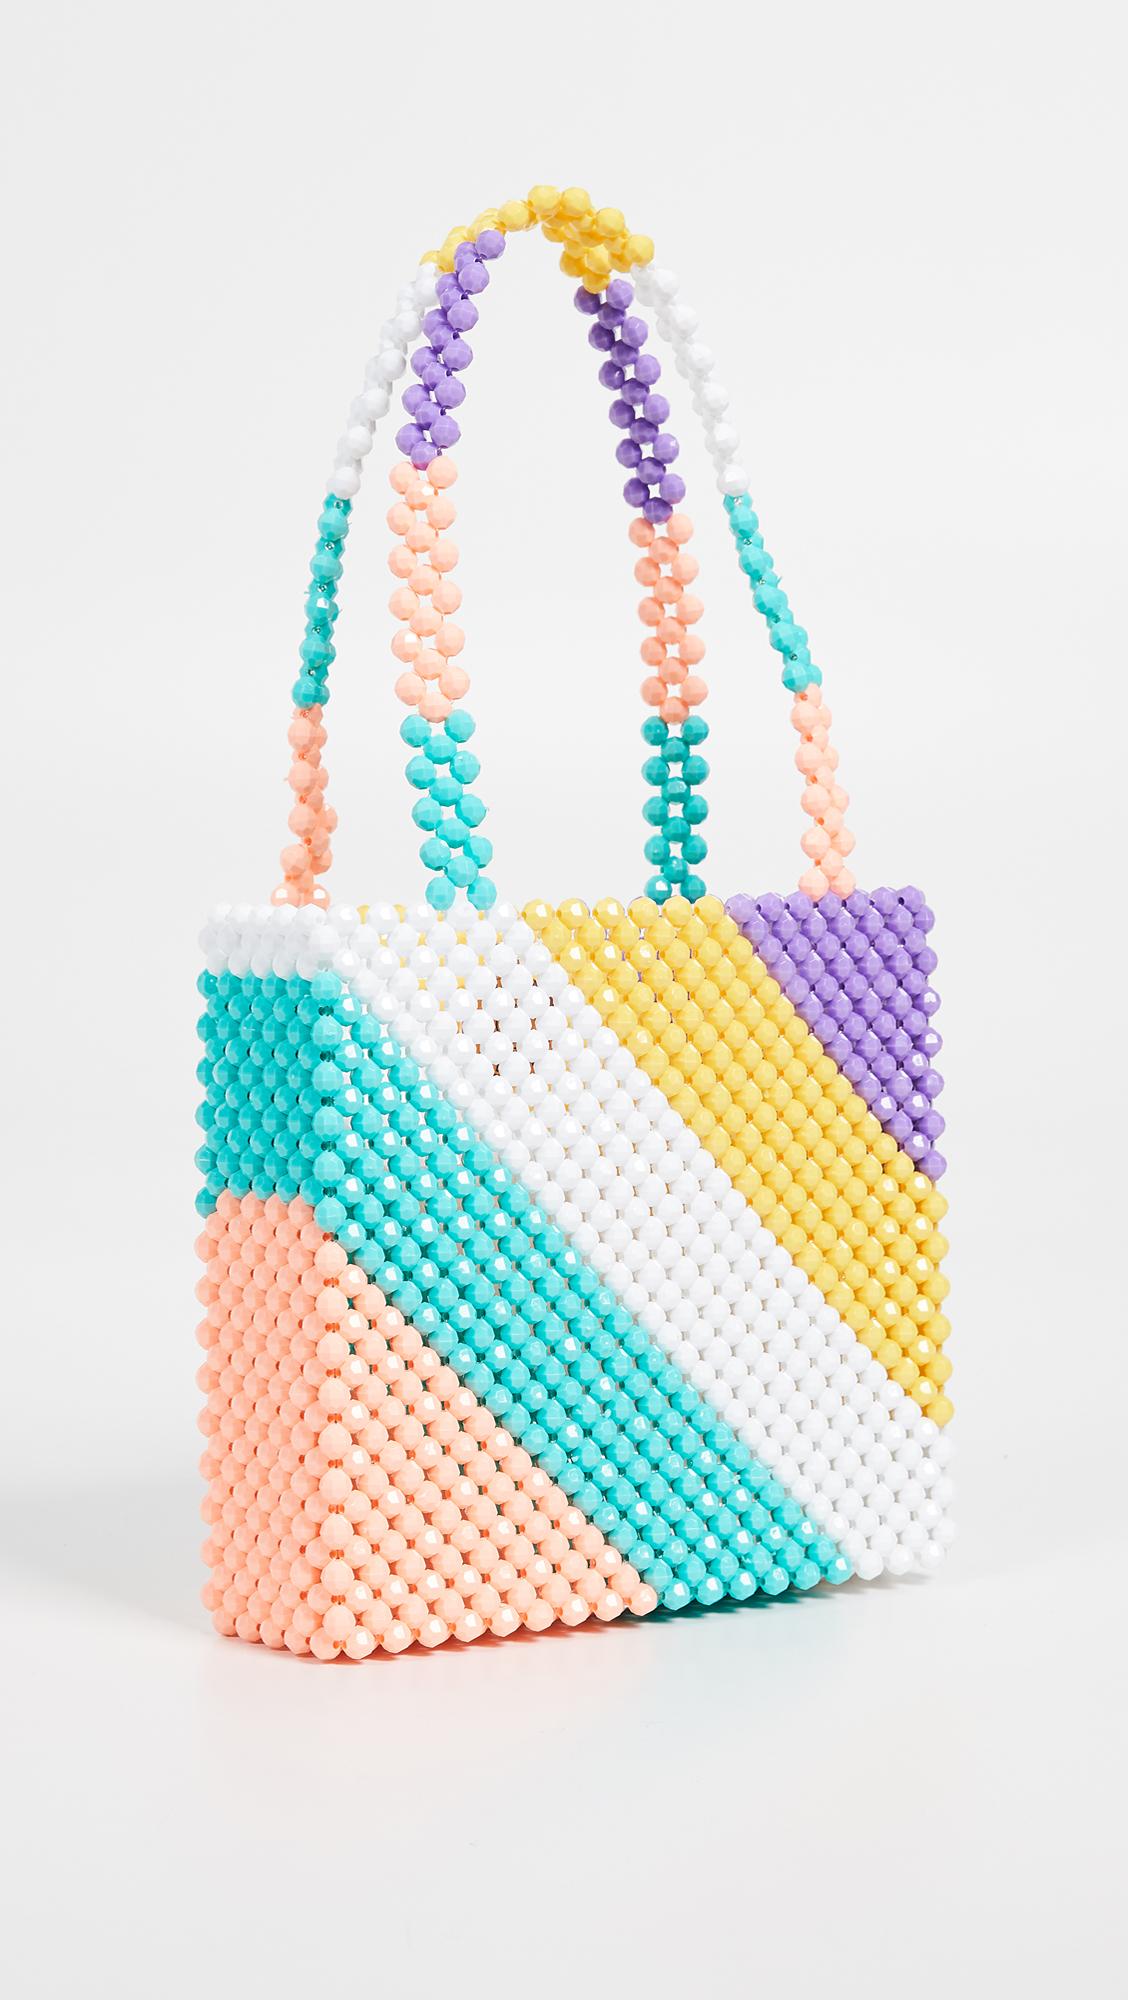 Super Cute Woven Beaded Bags by Susan Alexandra - Granita Bag